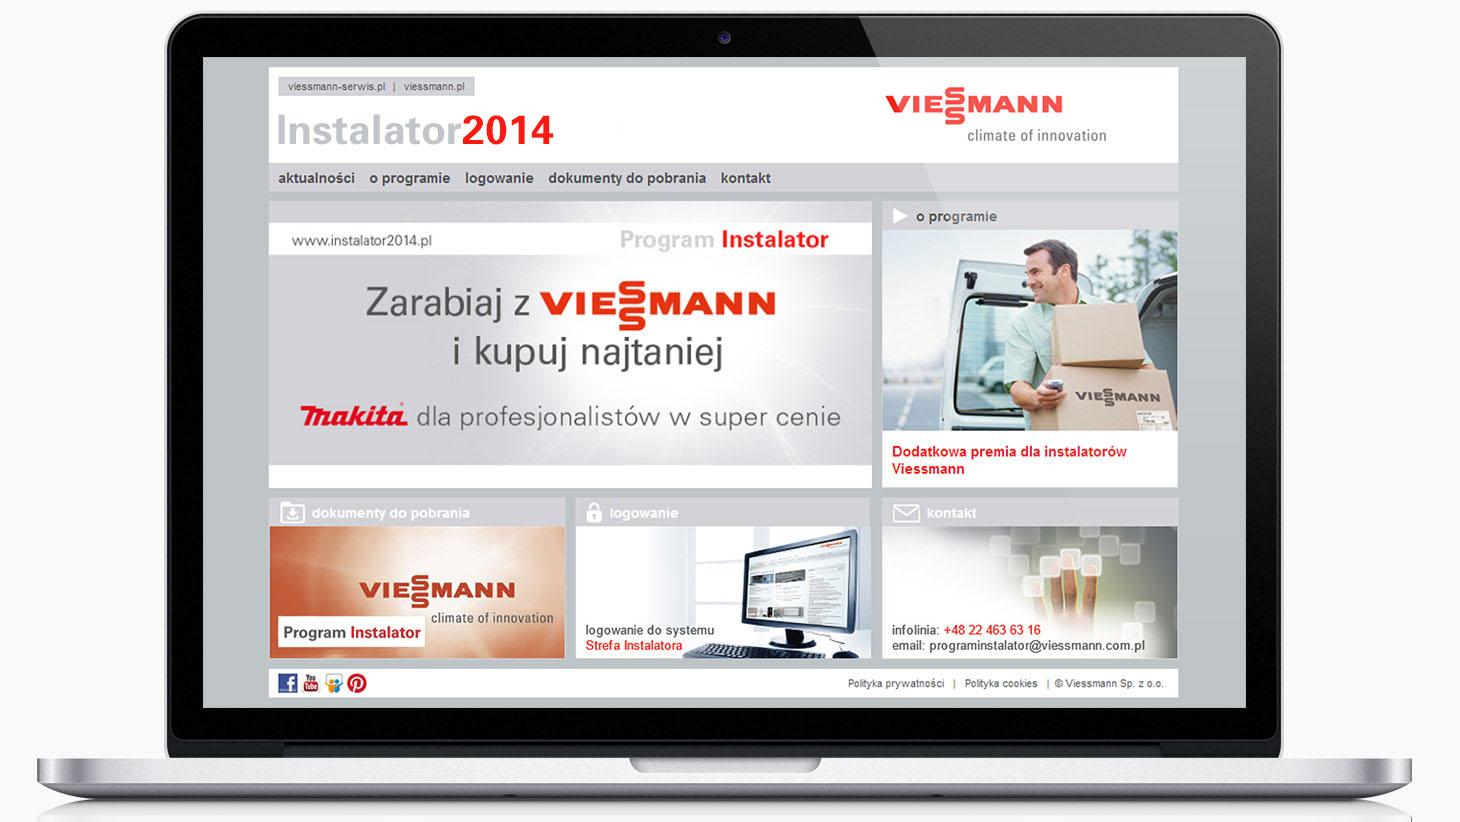 instalator 2014